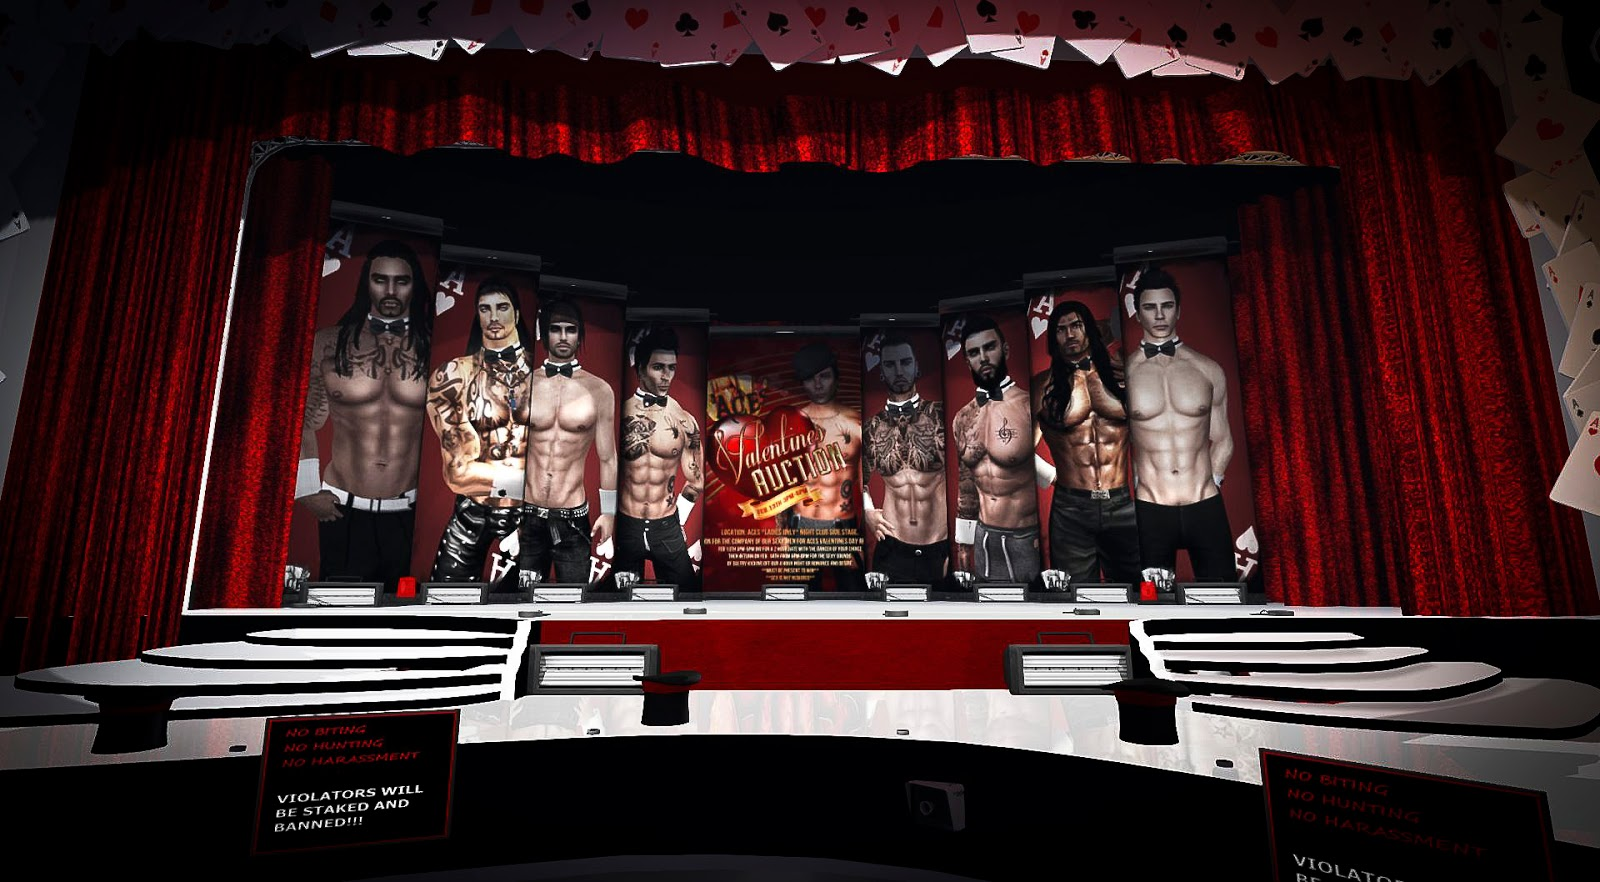 So Many Ways to Play! Spotlight on Aces Male Strip Club: - Lanai ...